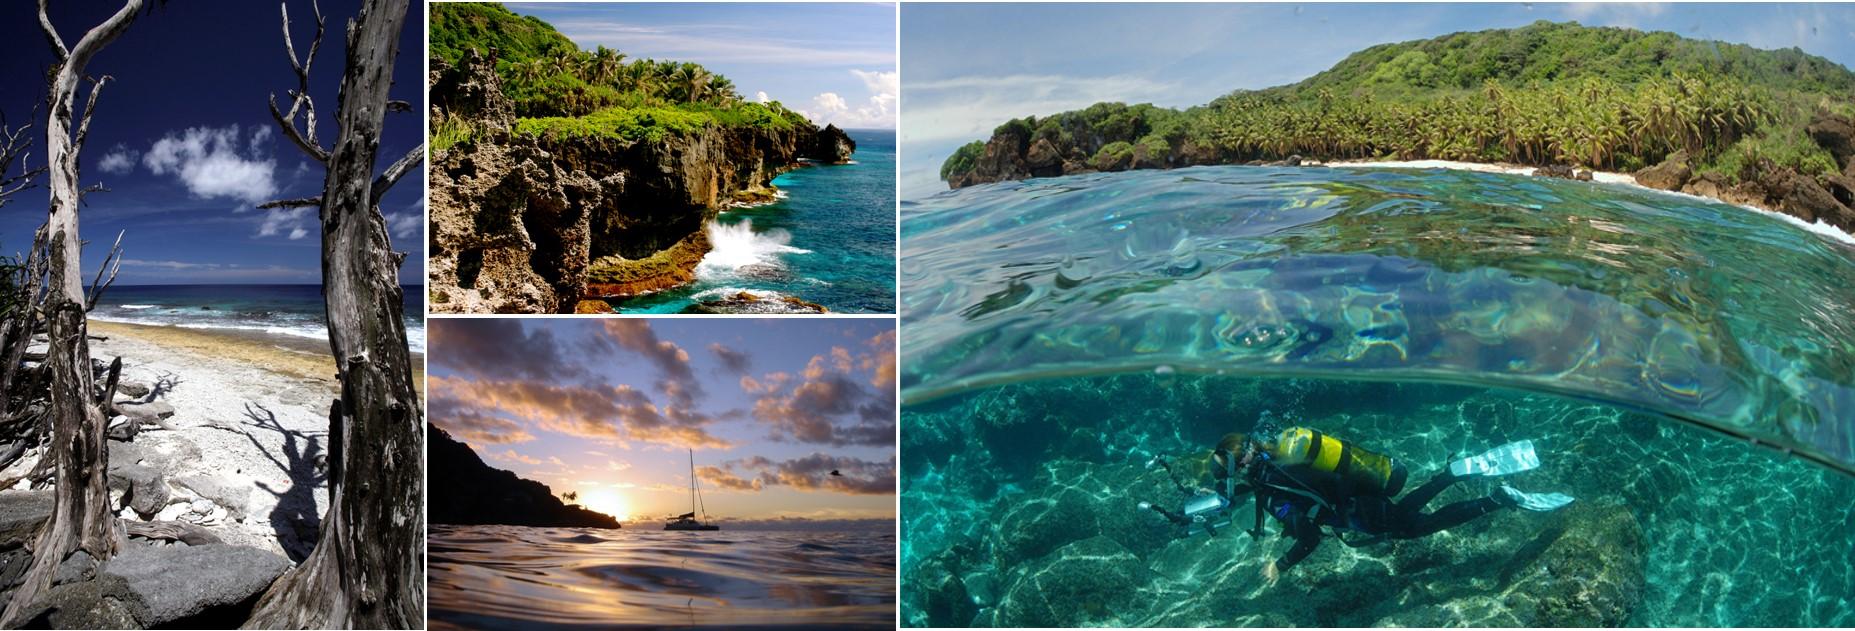 Paisajes de Christmas Island. Inger Vandyke, Erica Harrison, Linda Cash, Justin Gilligan